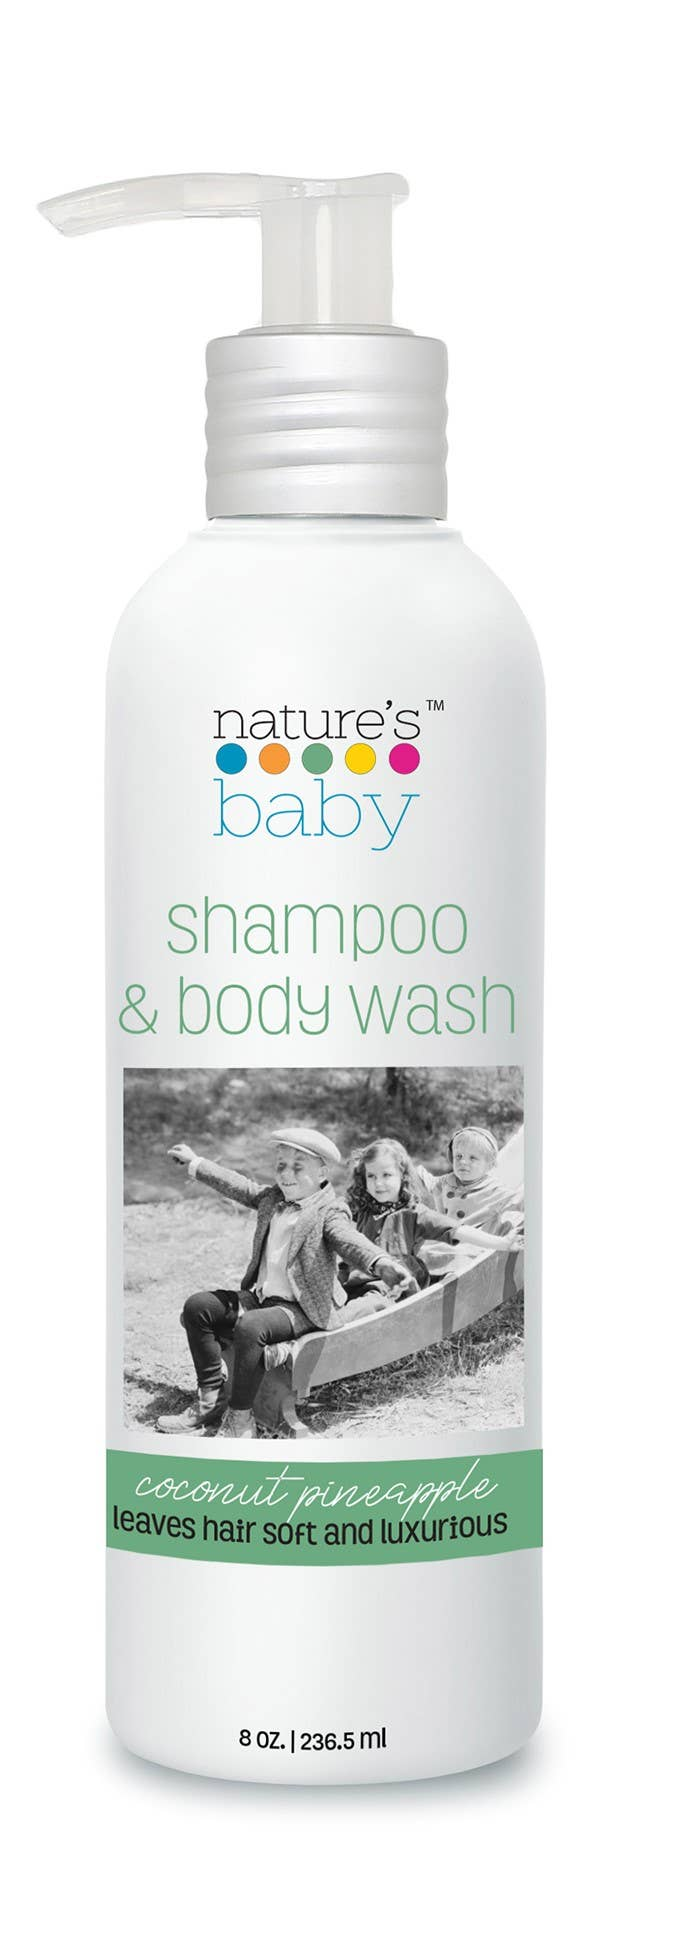 Shampoo & Body Wash - 8-oz Coconut Pineapple | Trada Marketplace